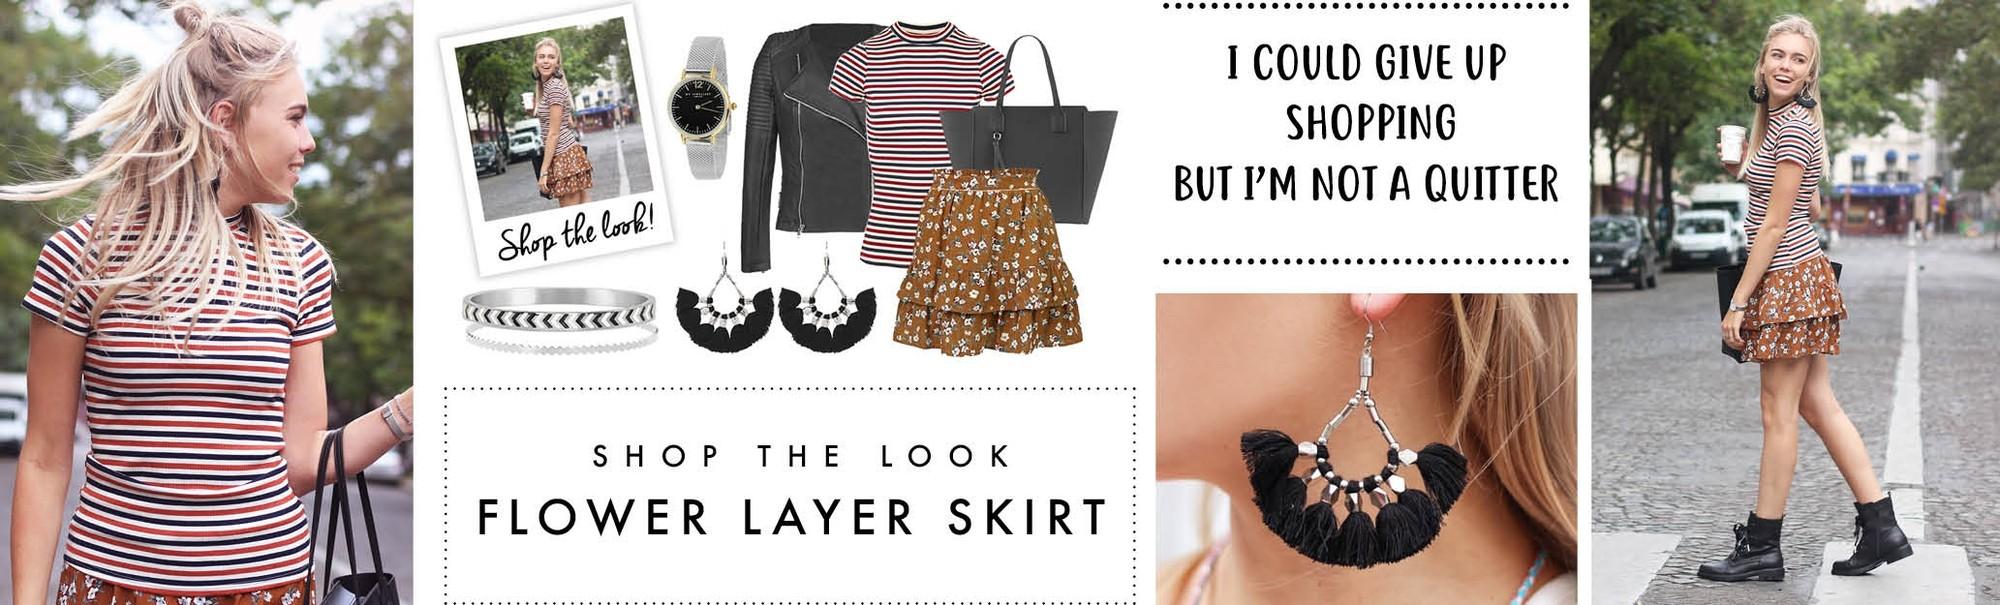 My Jewellery Flower Layer Skirt